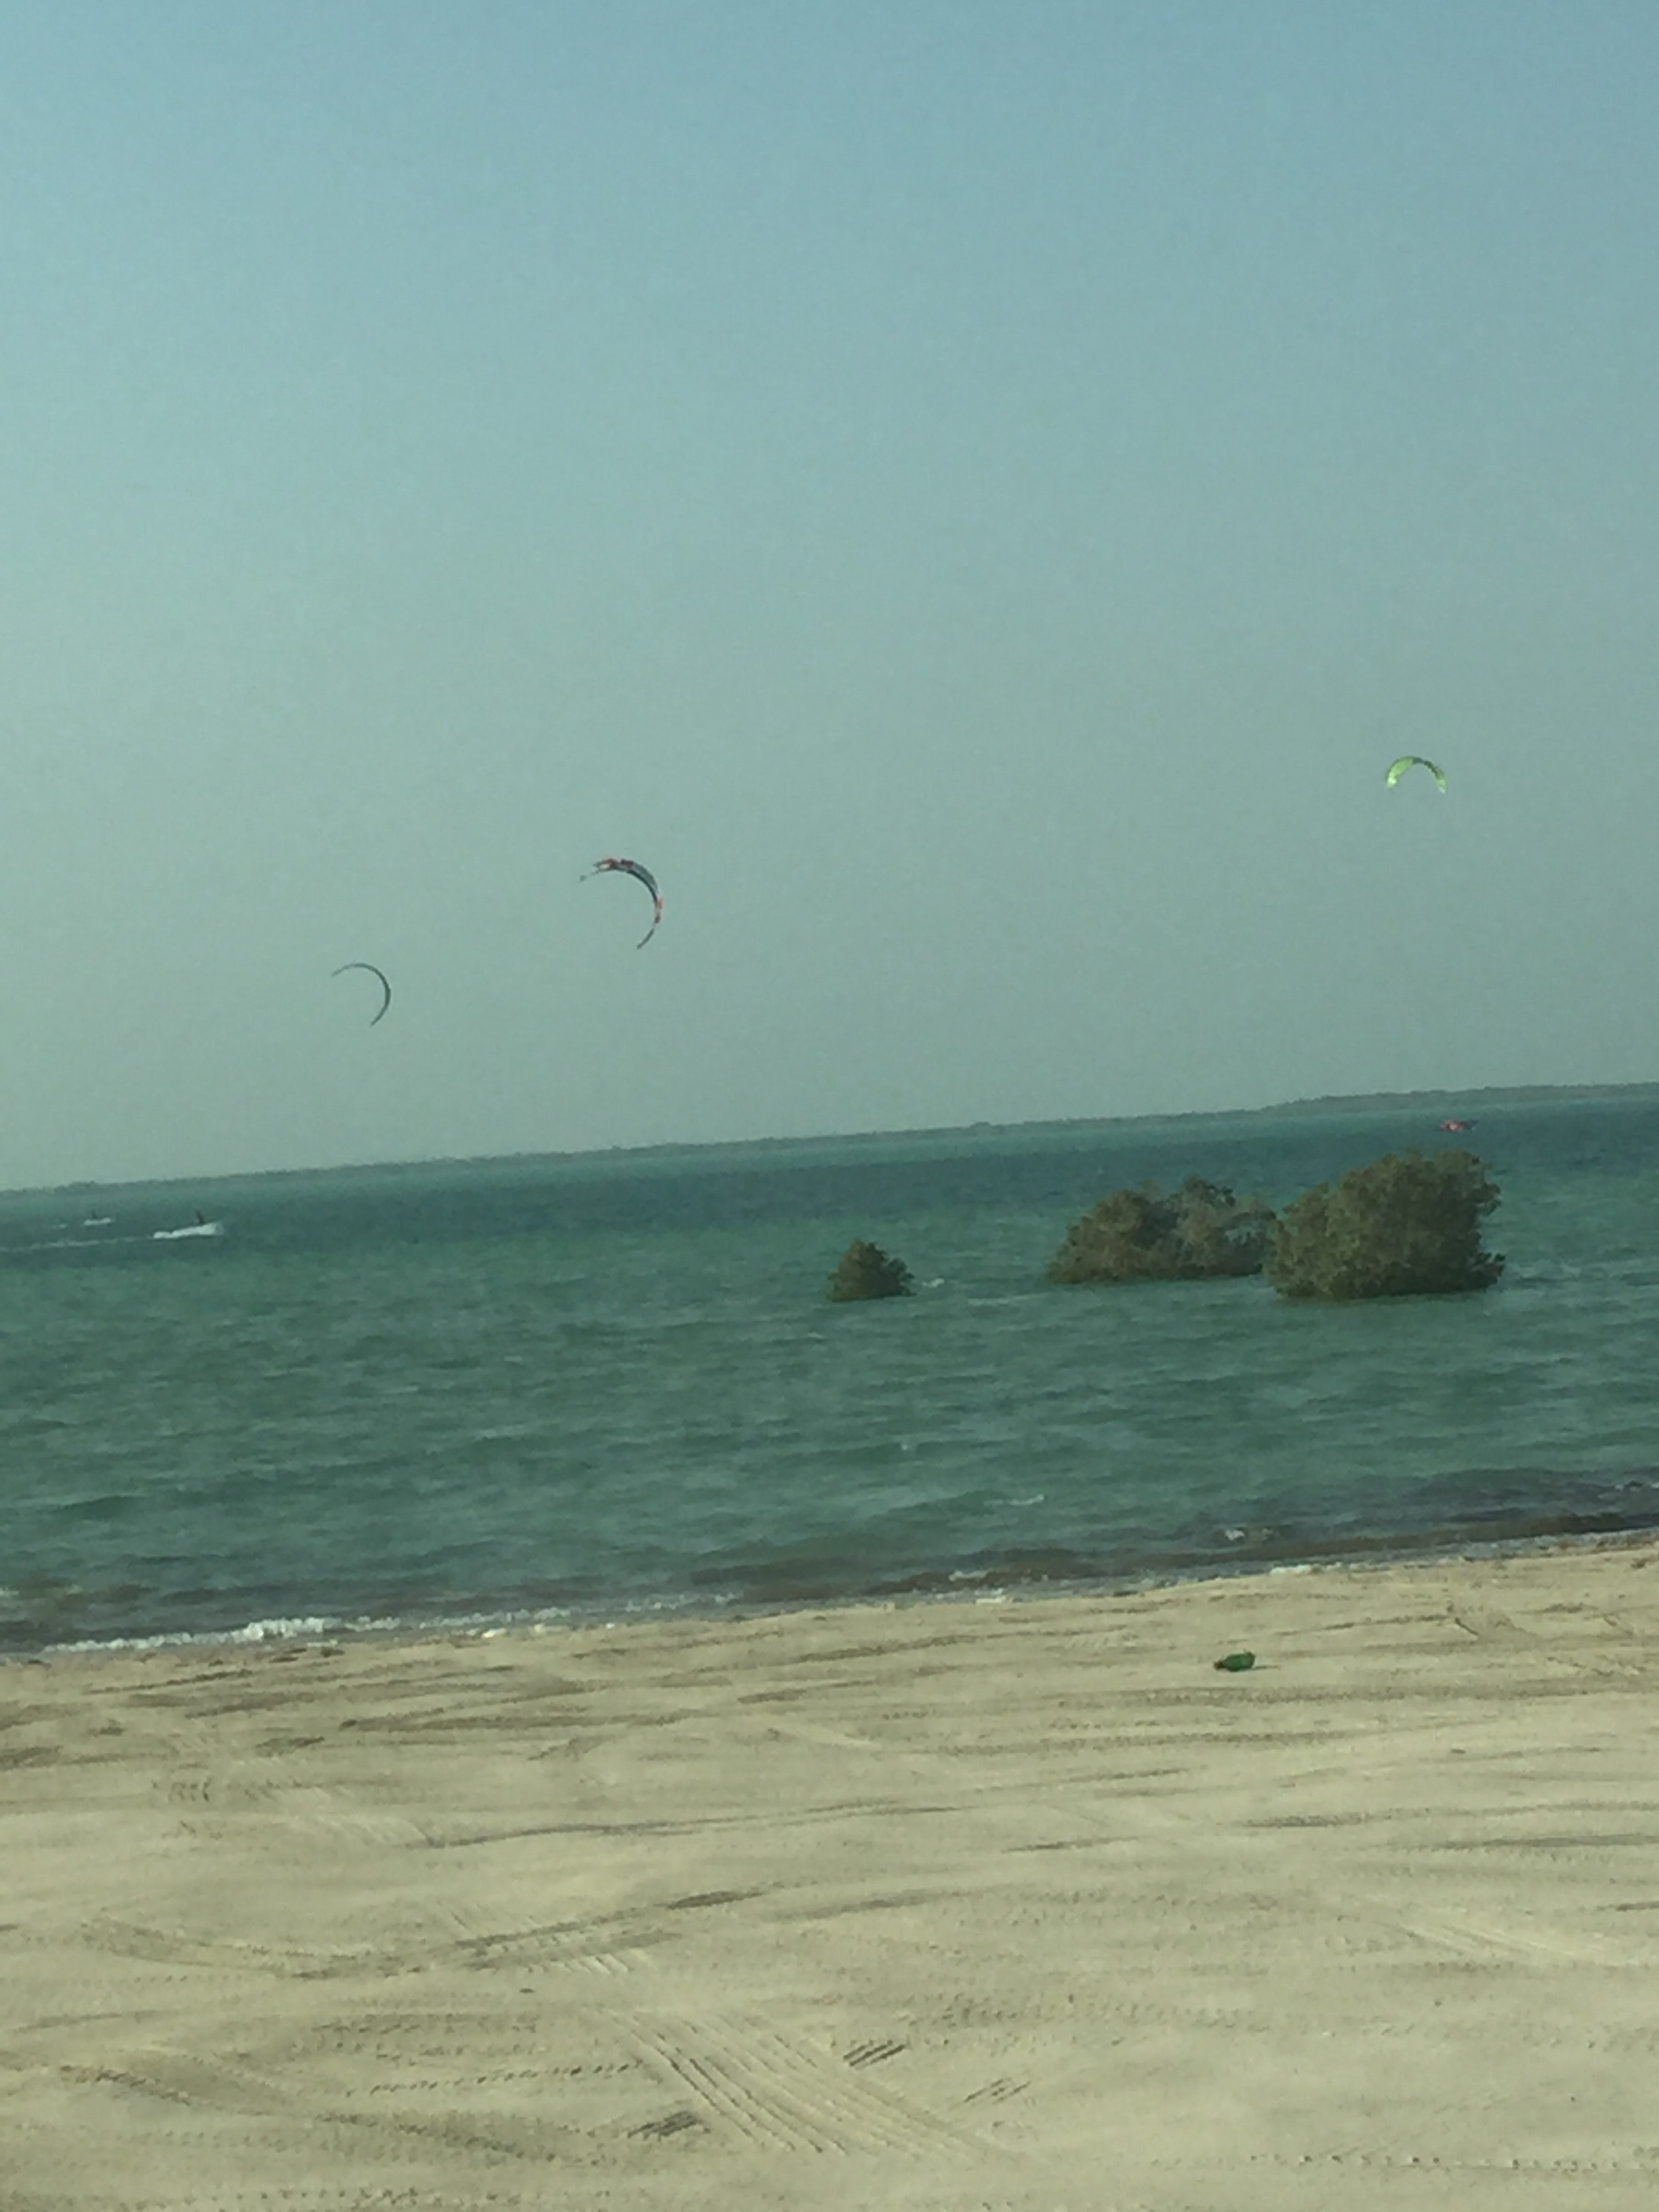 Kite surfing beach on Yas Island